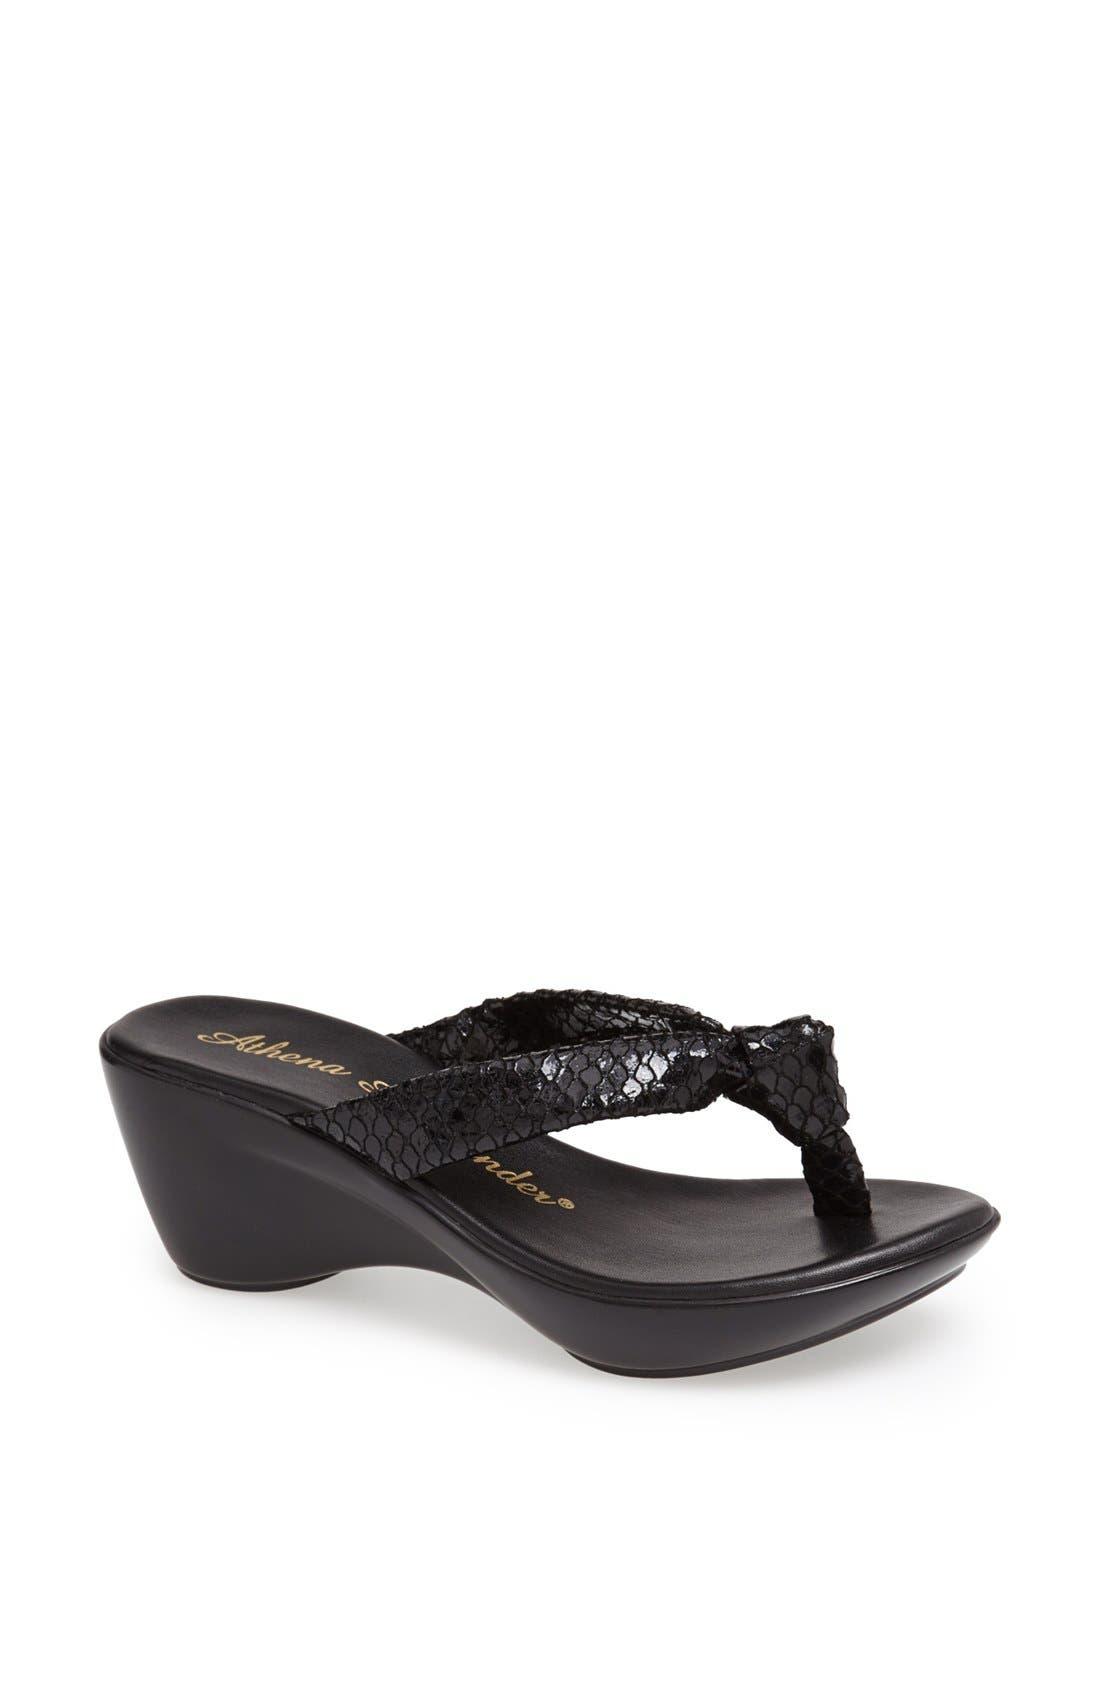 Main Image - Athena Alexander 'Ever' Wedge Sandal